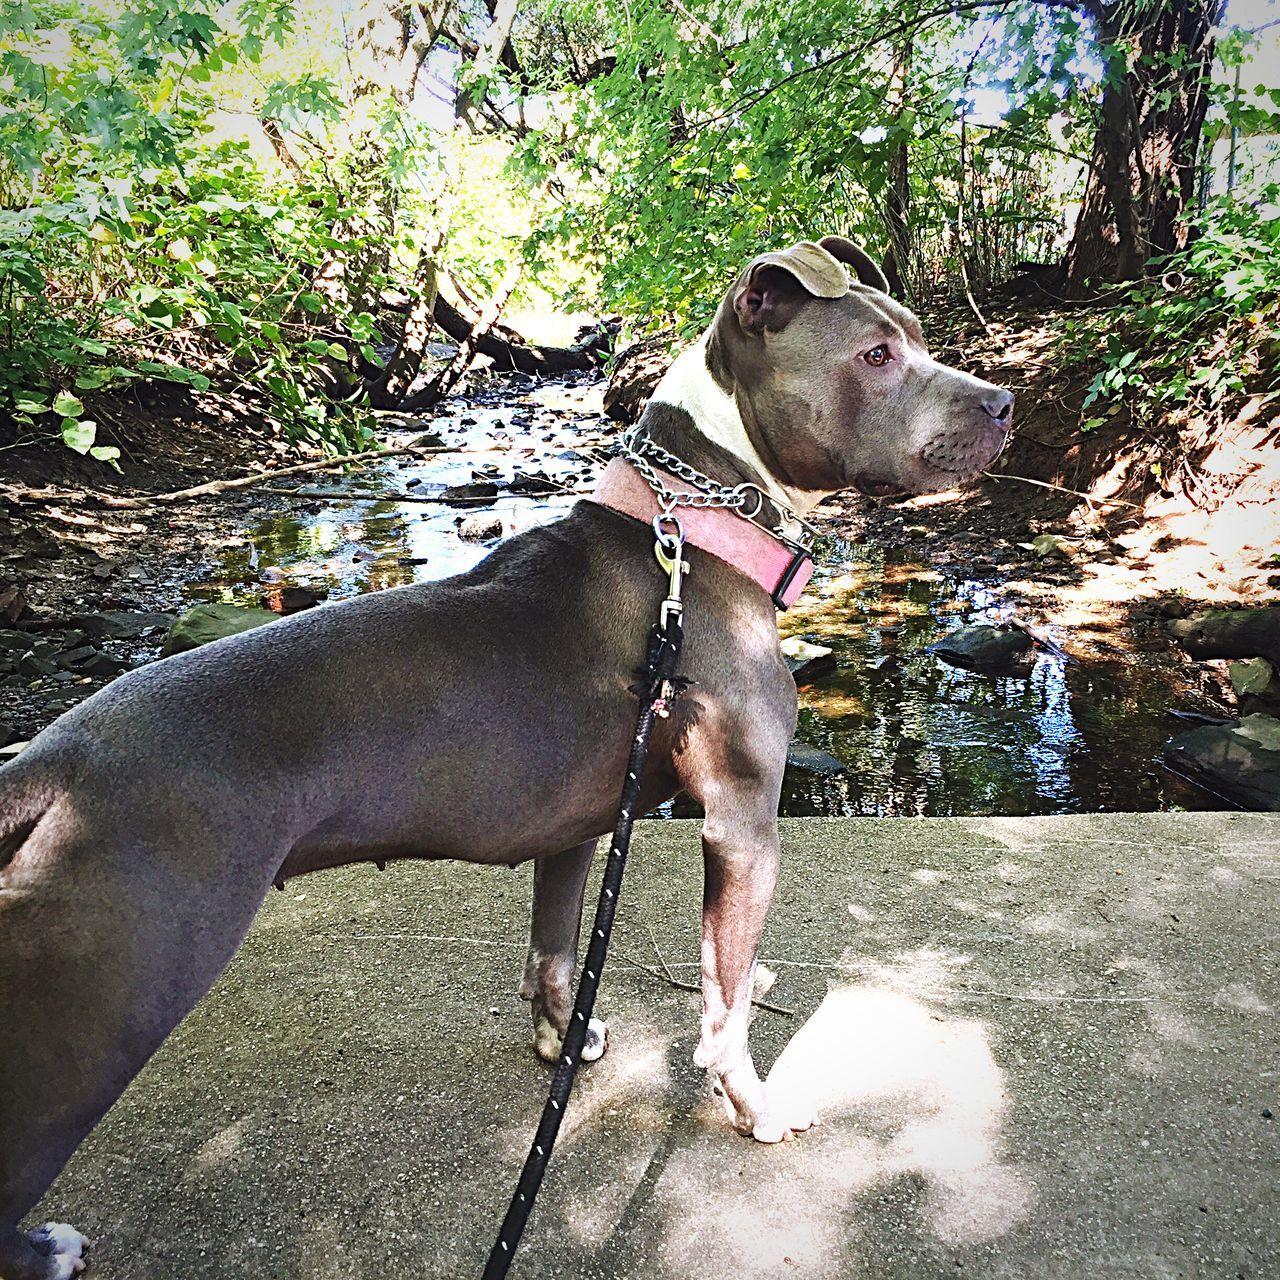 Dog On Wall Against Stream